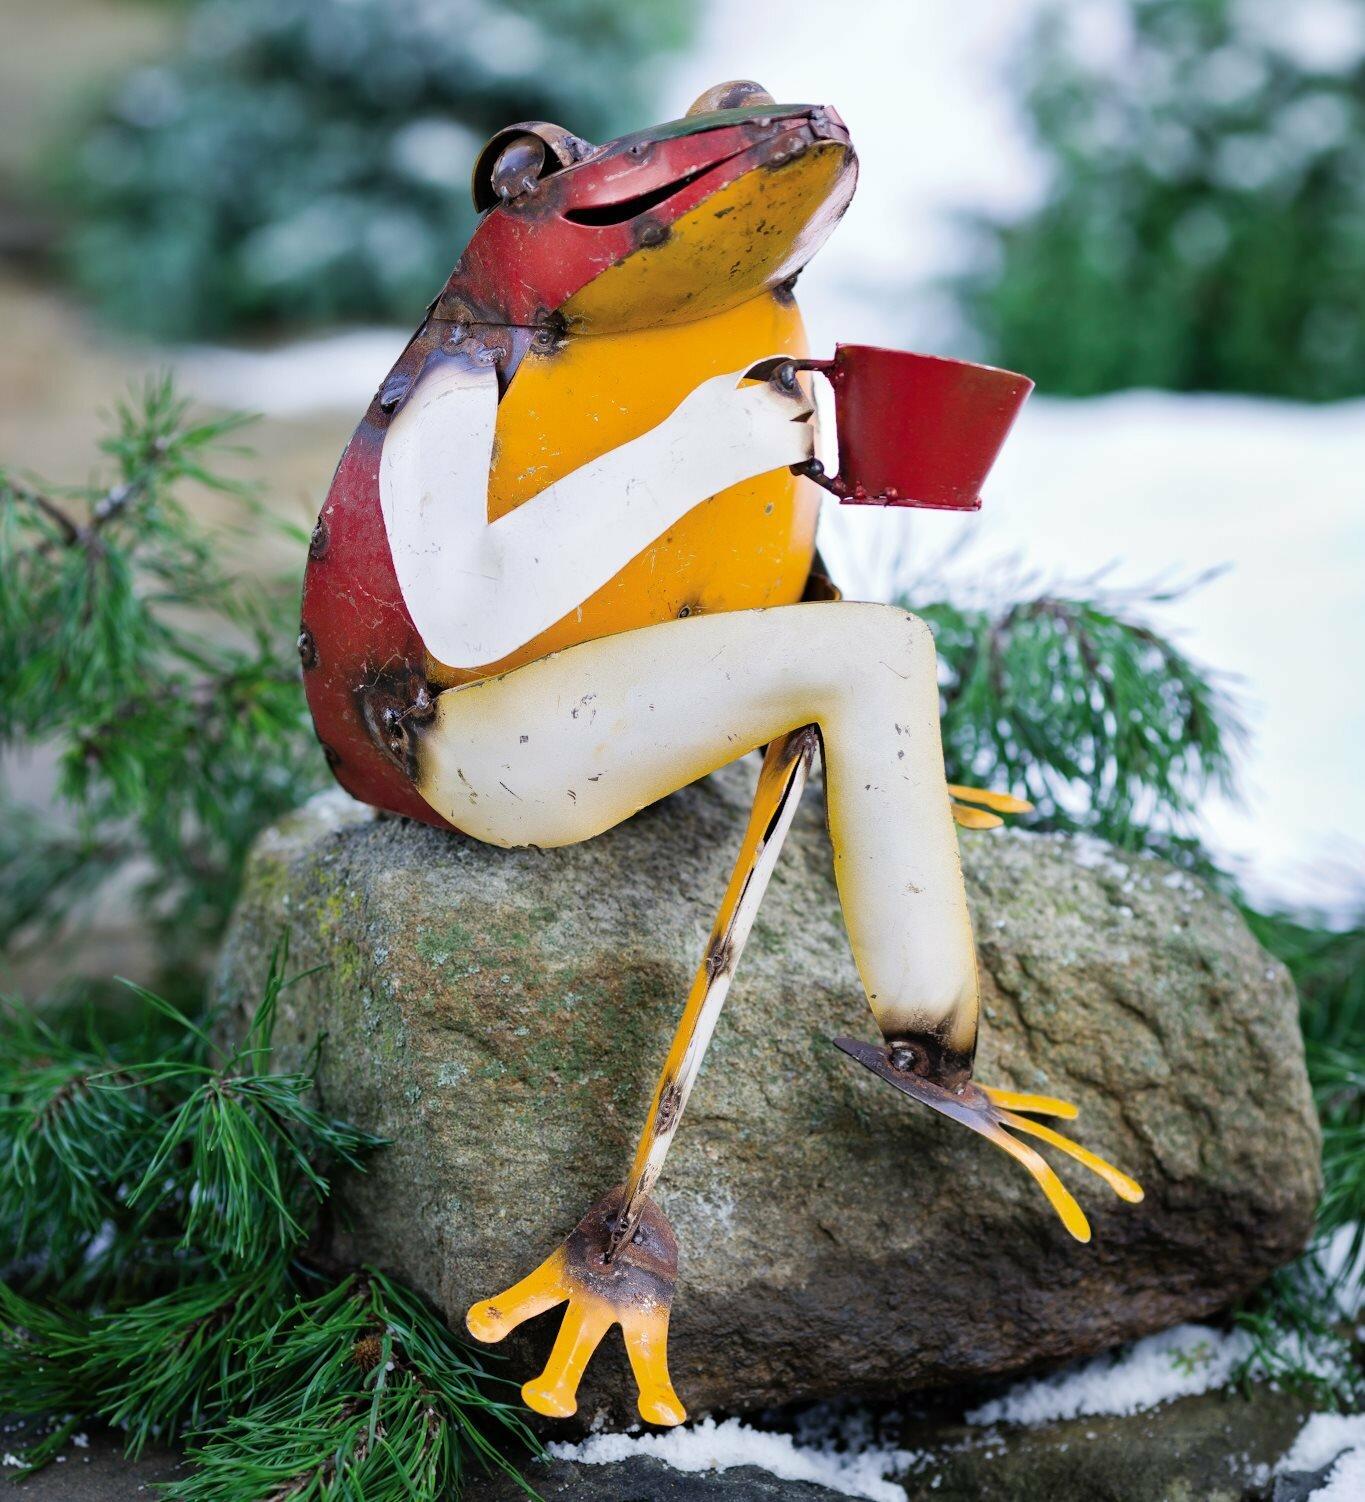 Plow Hearth Recycled Metal Coffee Frog Garden Statue Reviews Wayfair